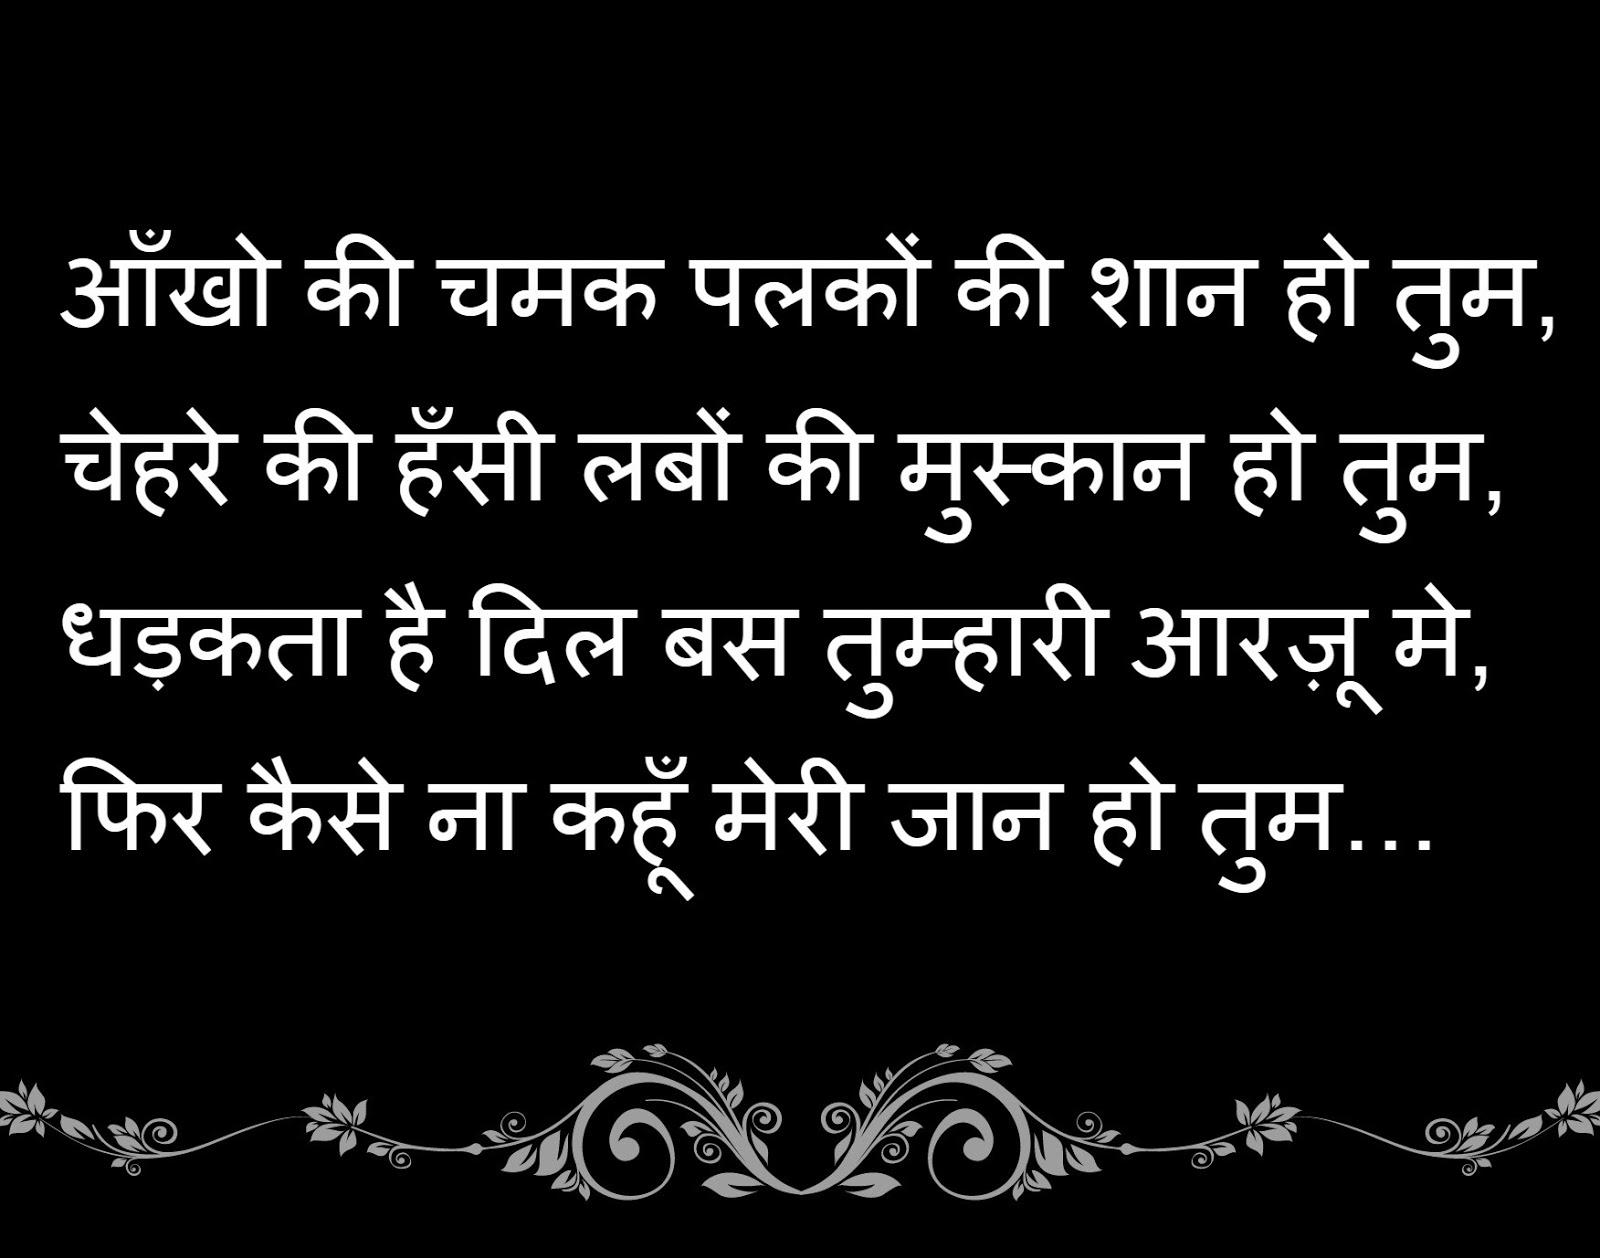 Life Shayari Life Shayari Image Life Shayari Status Life Shayari Facebook Life Shayari Pic Life Shayari In Hindi Life Shayari In Urdu New Whatsapp